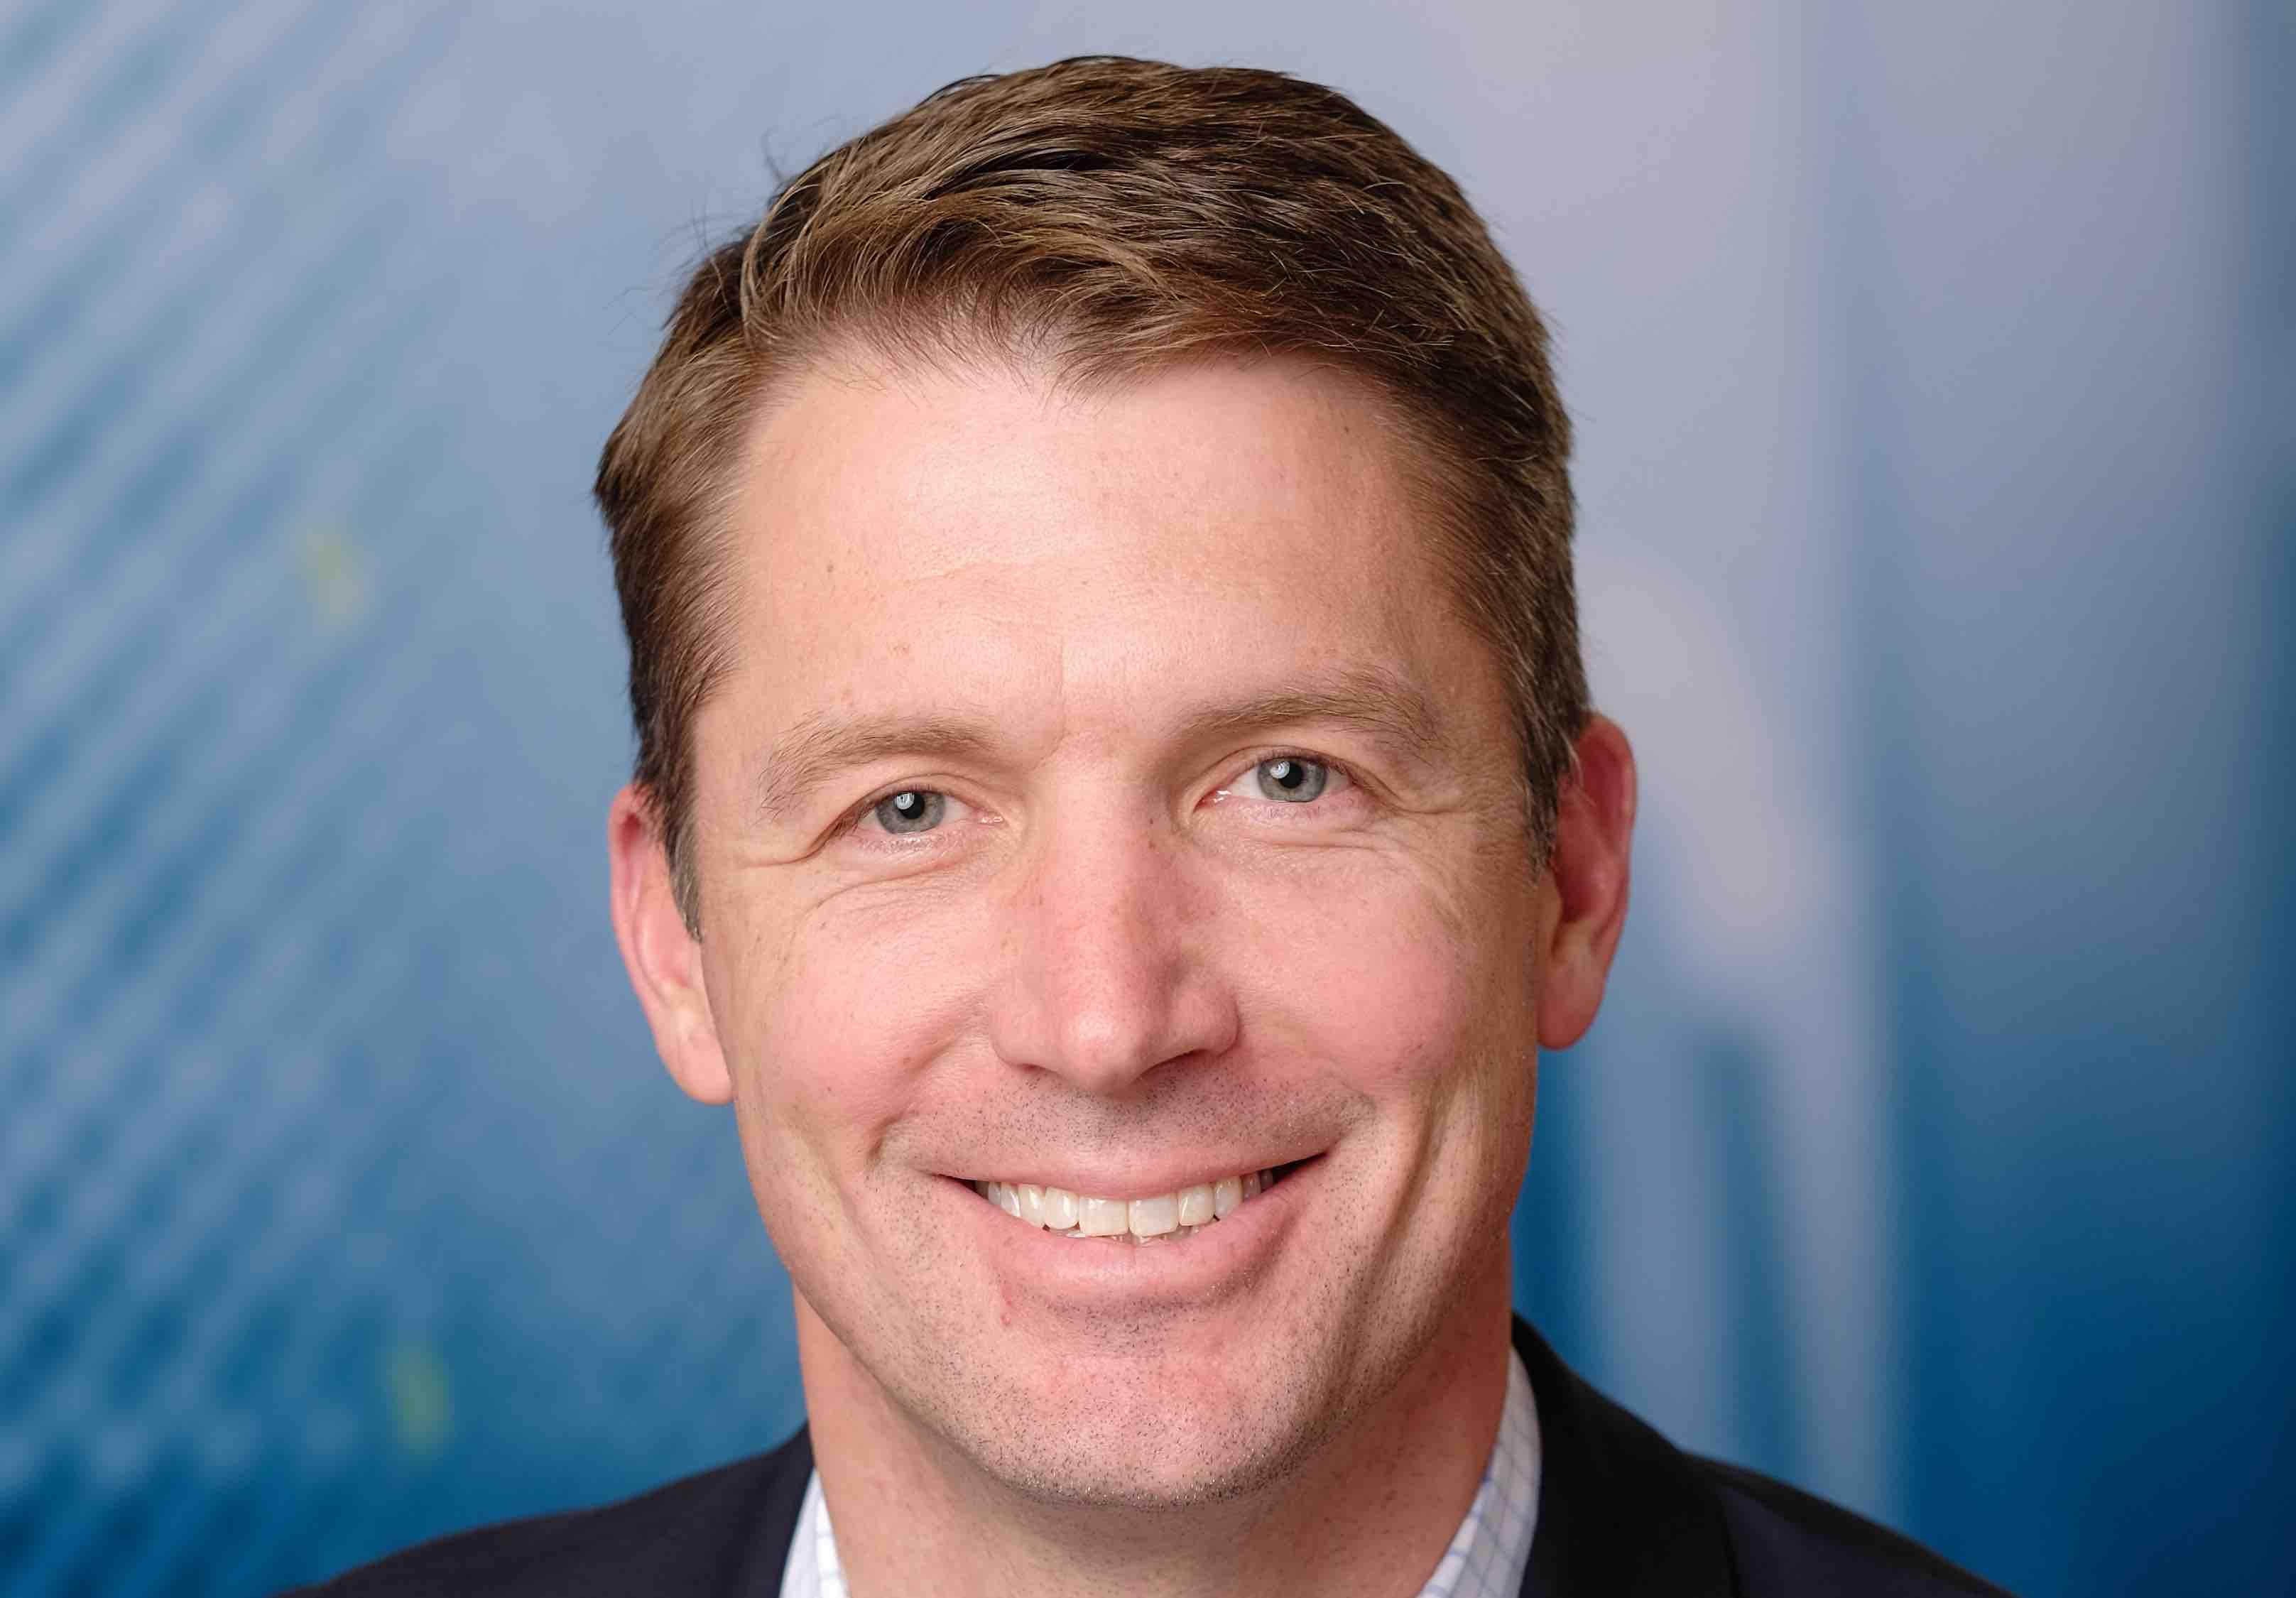 The 2017 Top 25 Consultants: Jim Bramblet